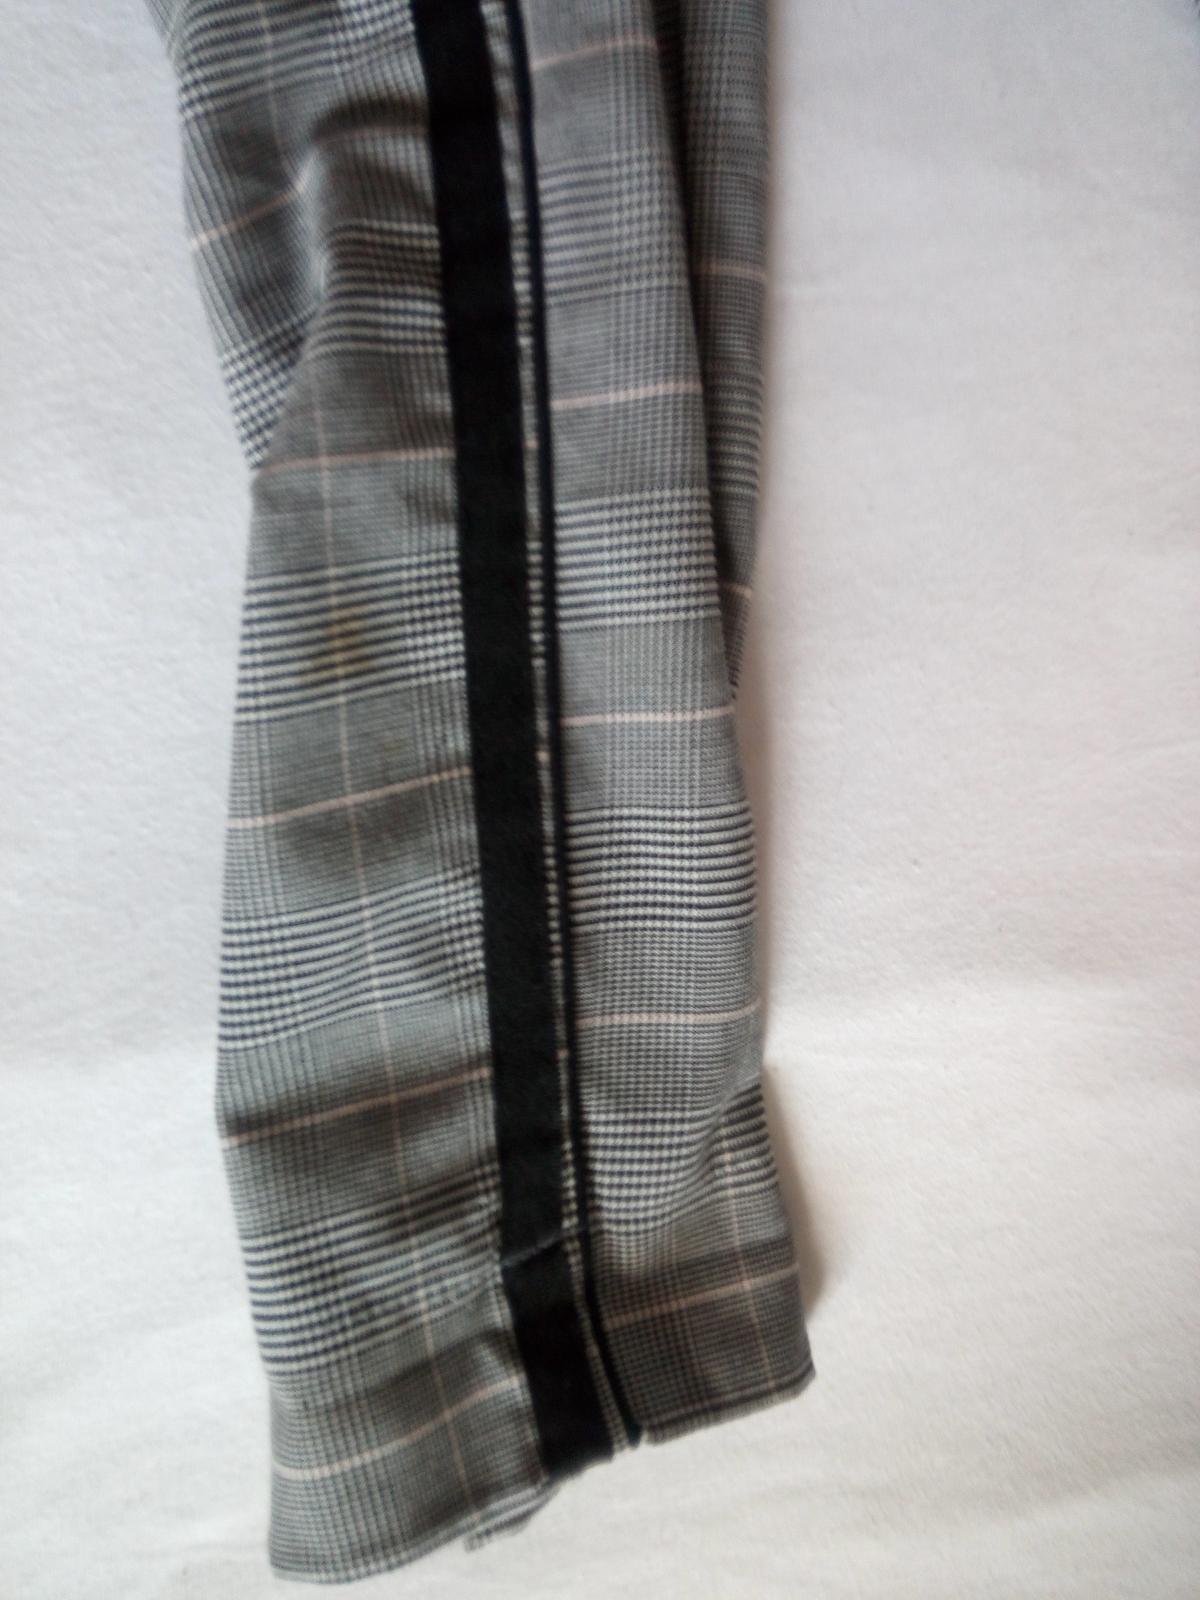 Kárované nohavice S - Obrázok č. 3